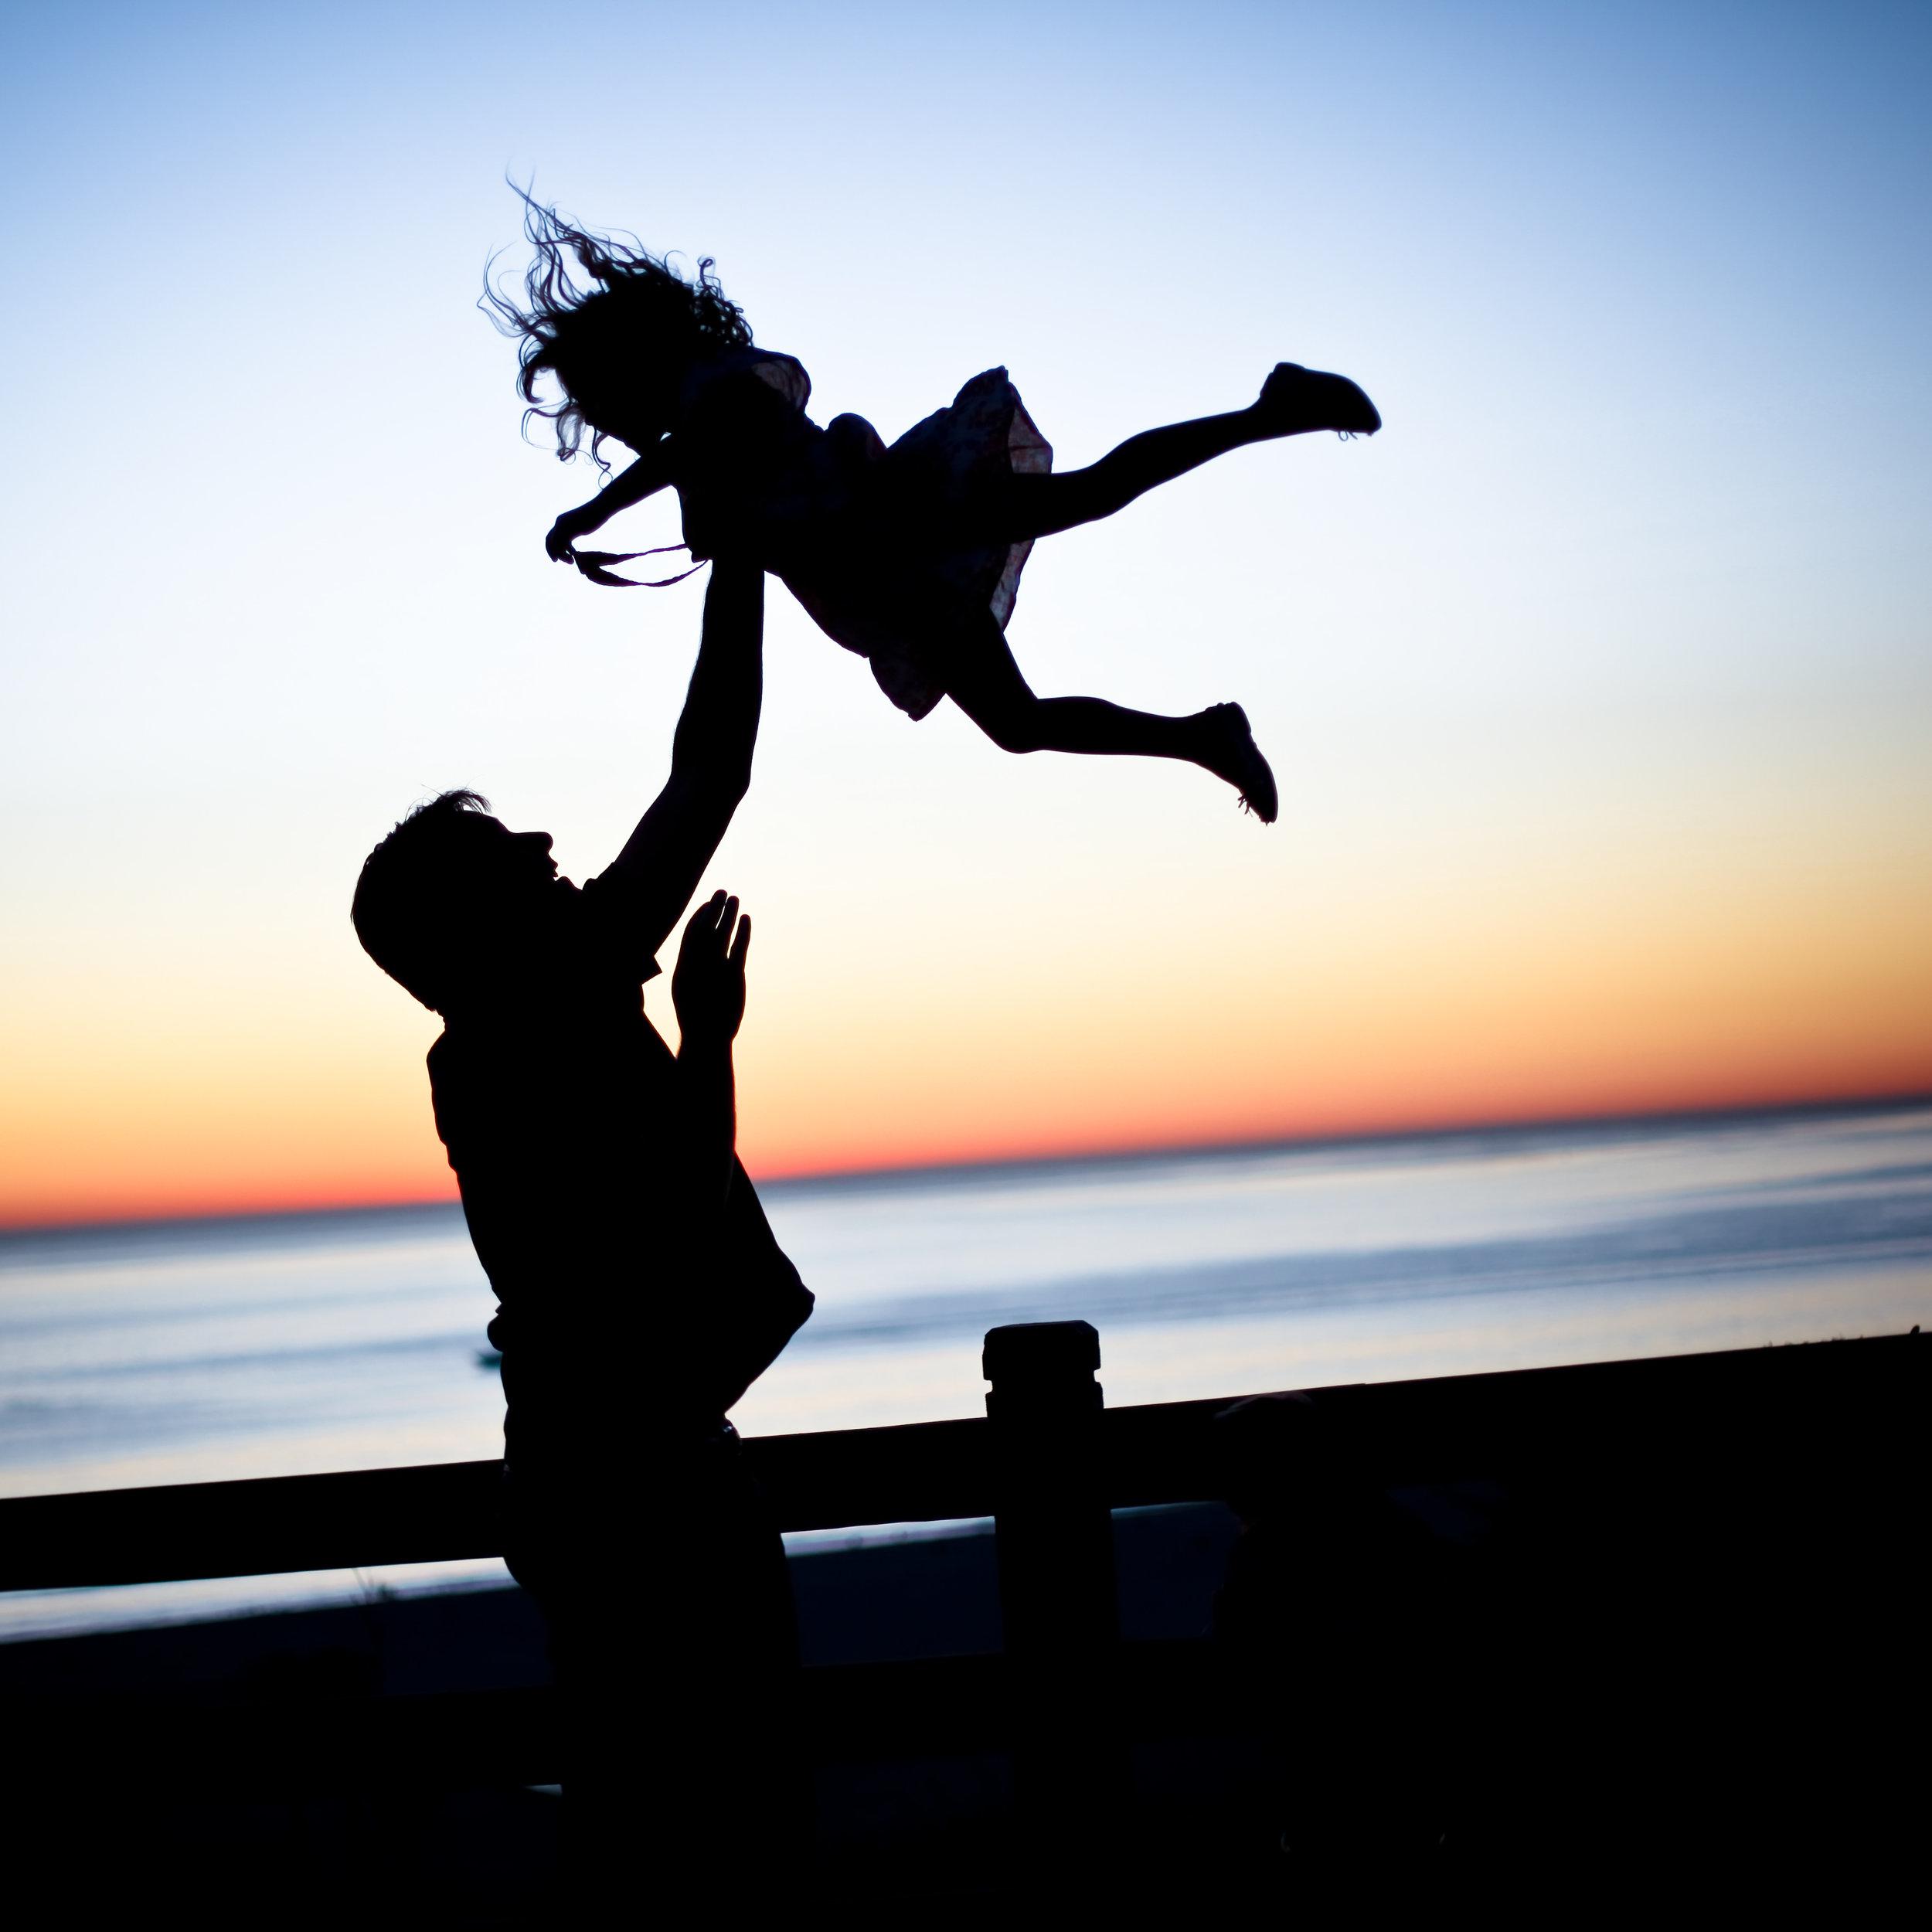 Vertrauen-Trust-father-daughter-Vater-Tochter